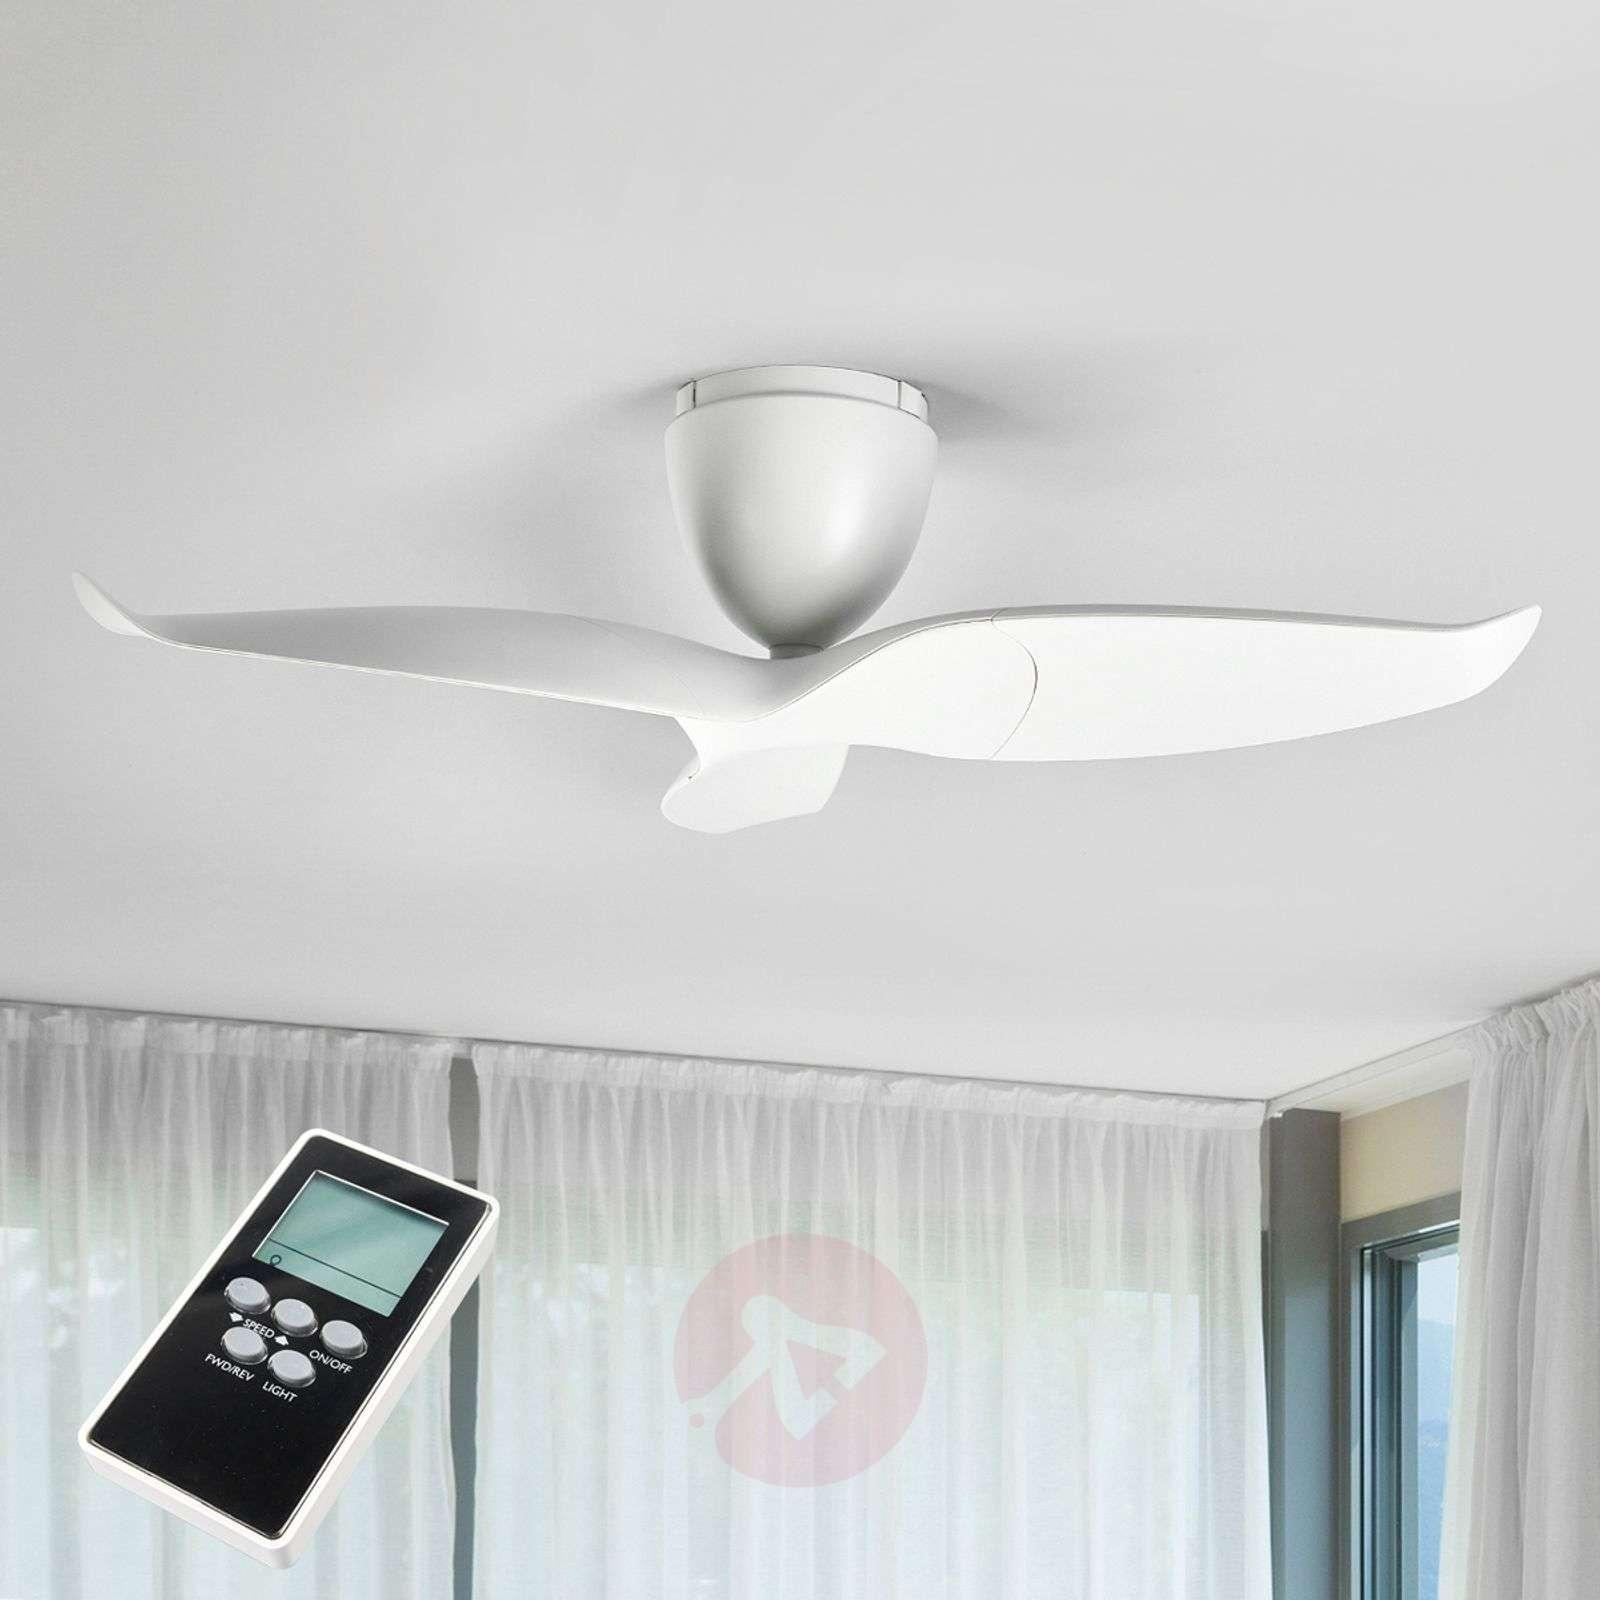 Ceiling fan Aeratron, white, 109.2 cm-1068009-011